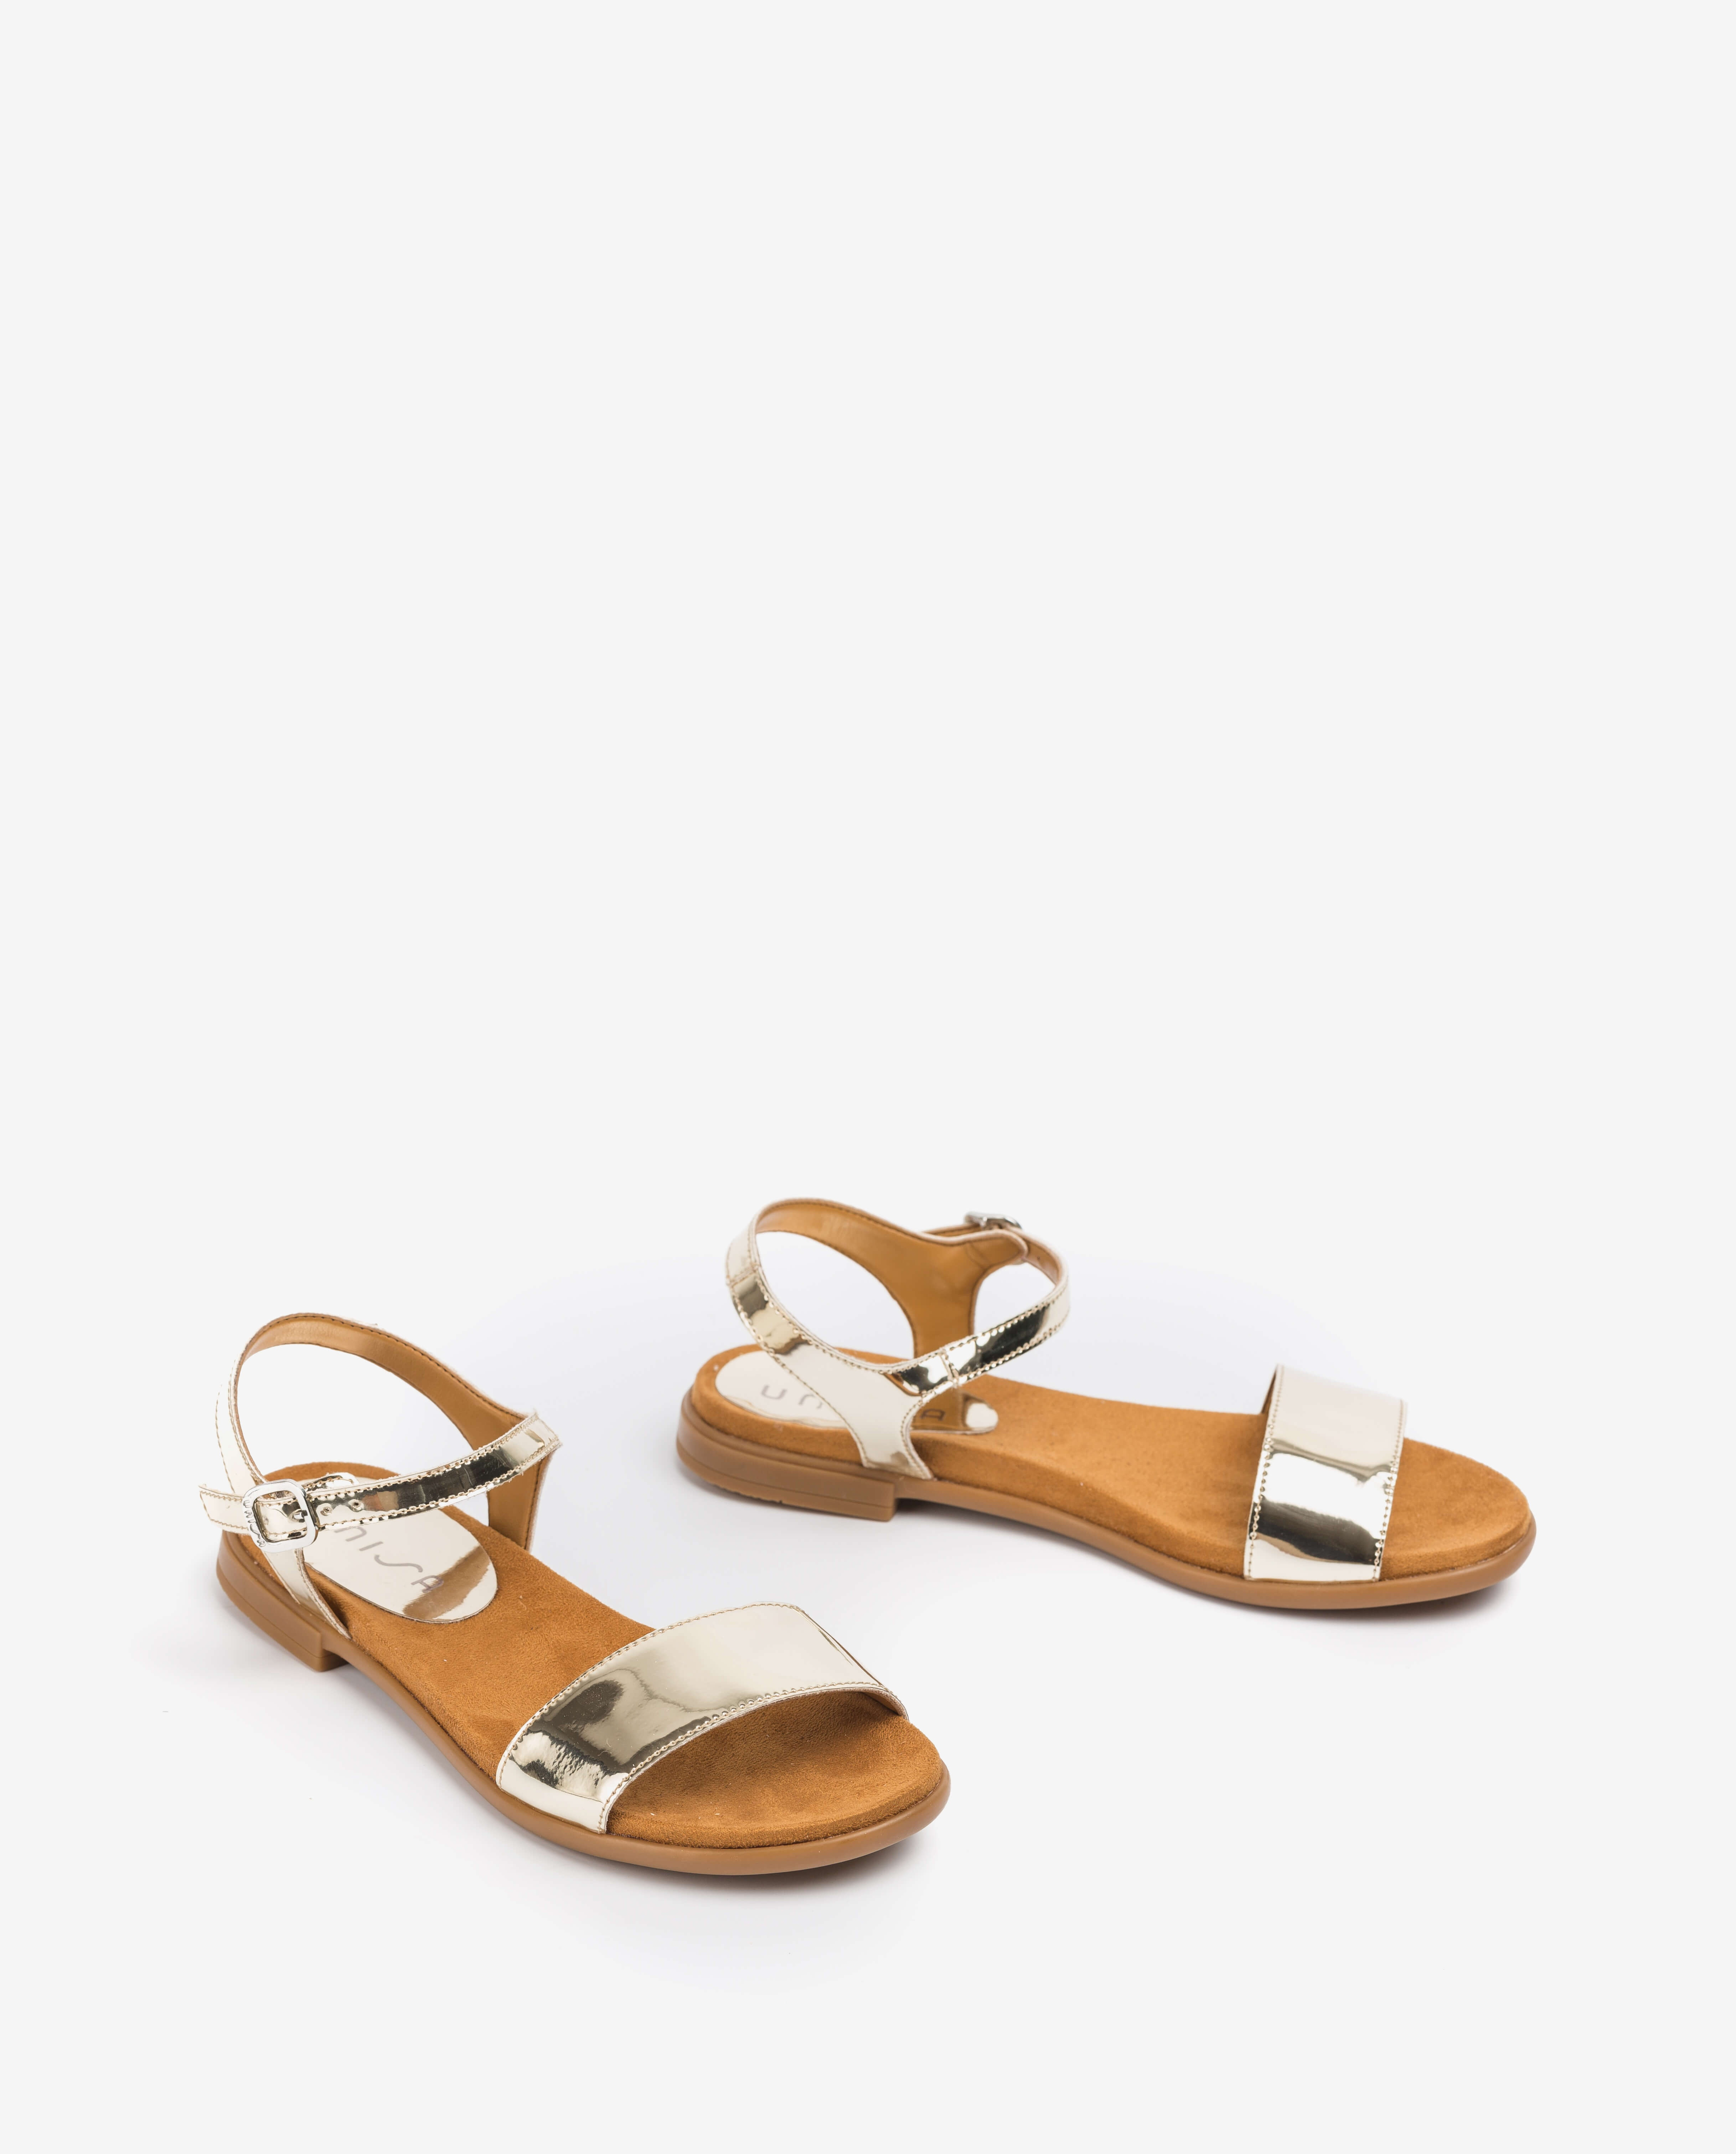 UNISA Little girl silver sandals LIRITA_20_C_SP_CAN platino 2